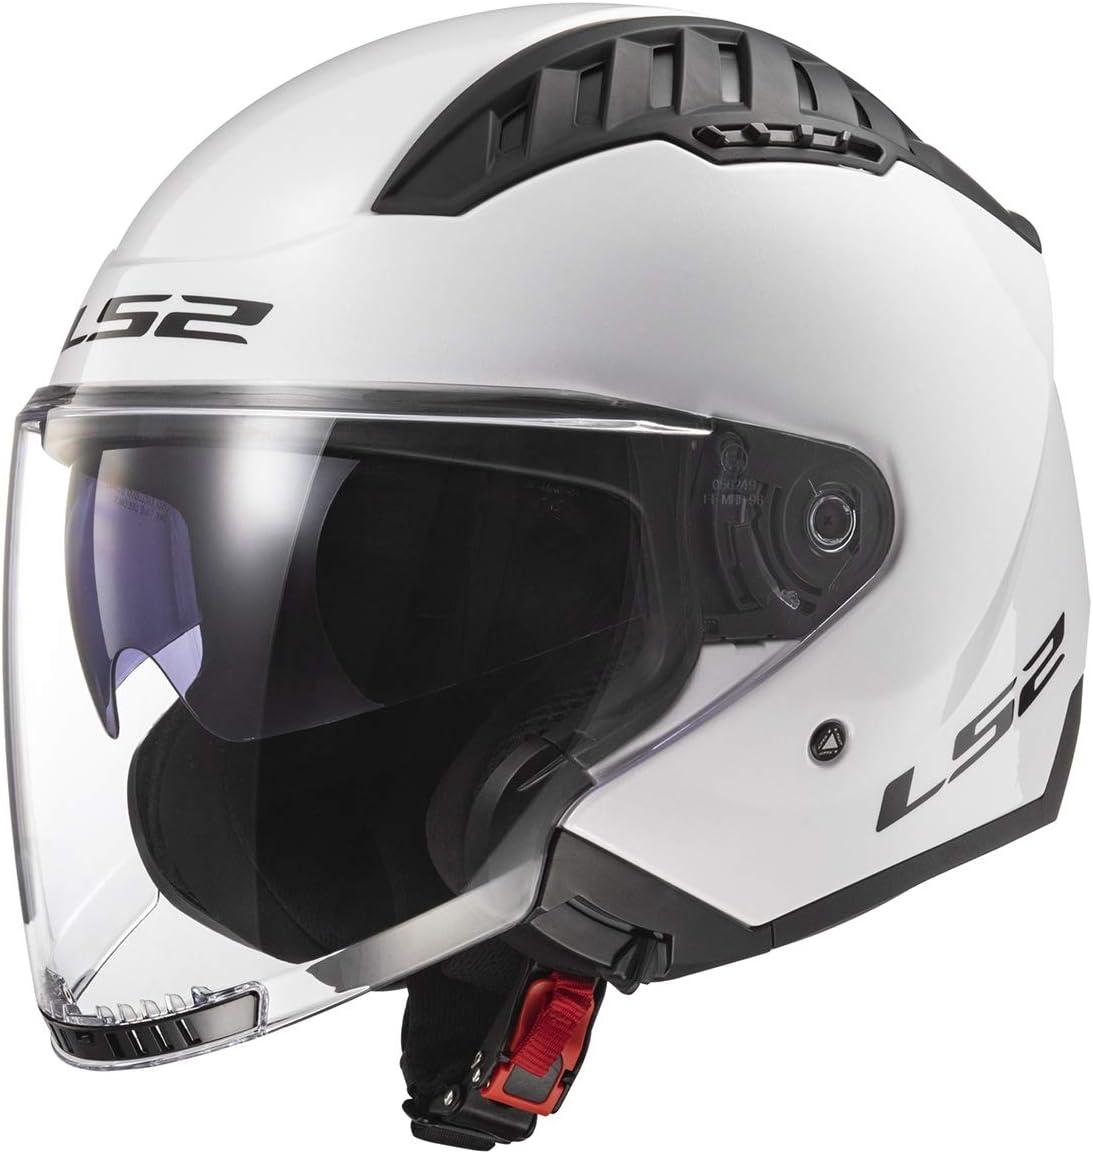 List price LS2 Helmets Copter Many popular brands Open Face White Gloss - X-Large Helmet